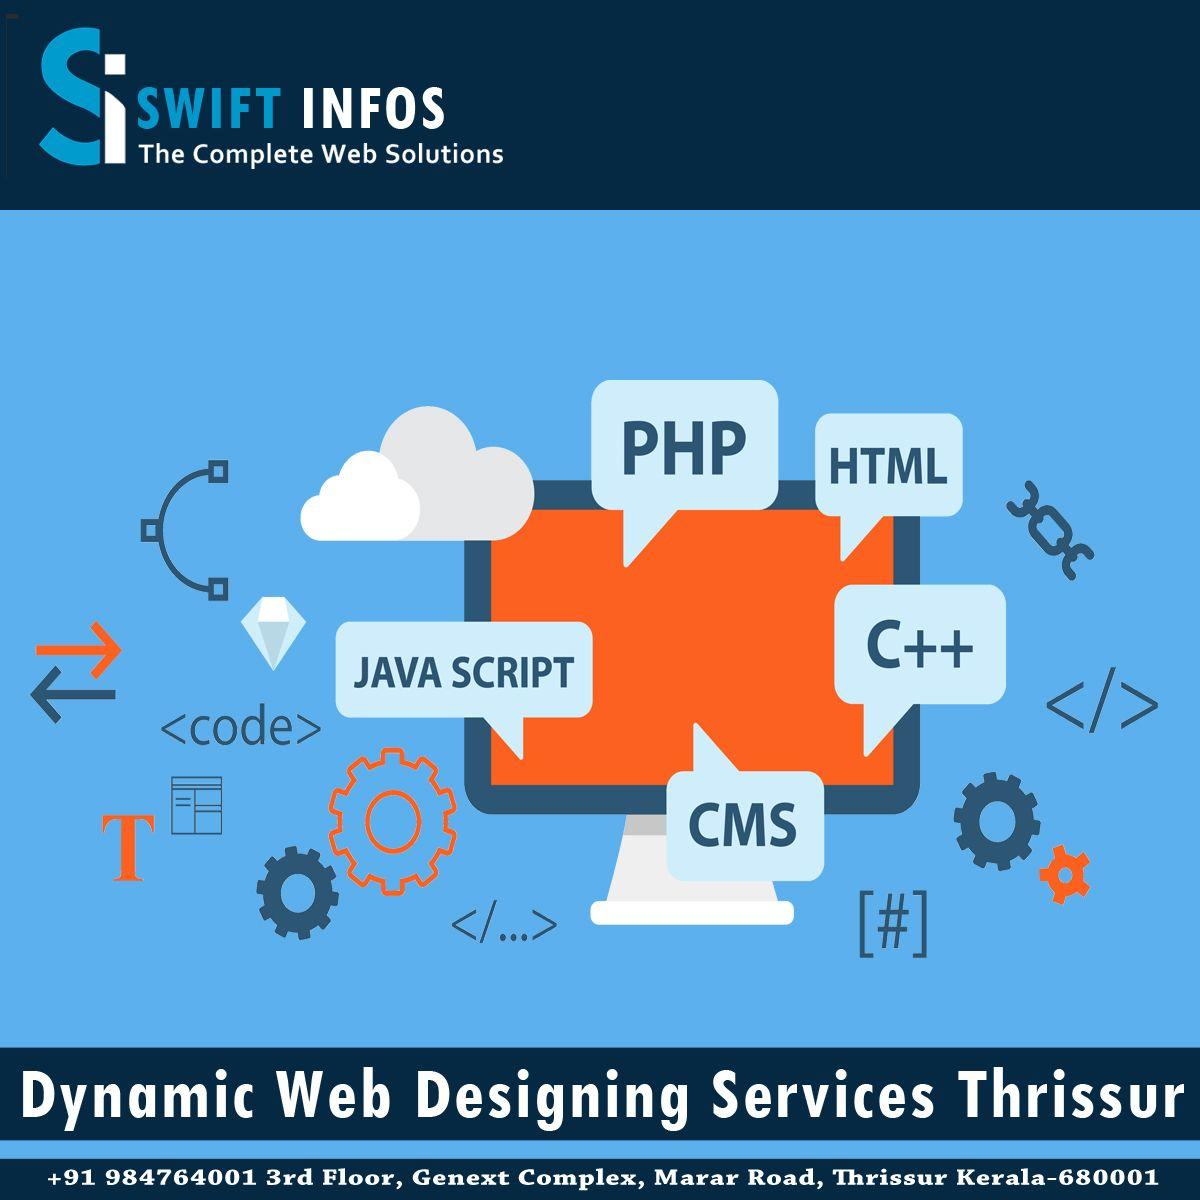 Dynamic Web Designing Services Thrissur Web Design Services Website Development Company Web Design